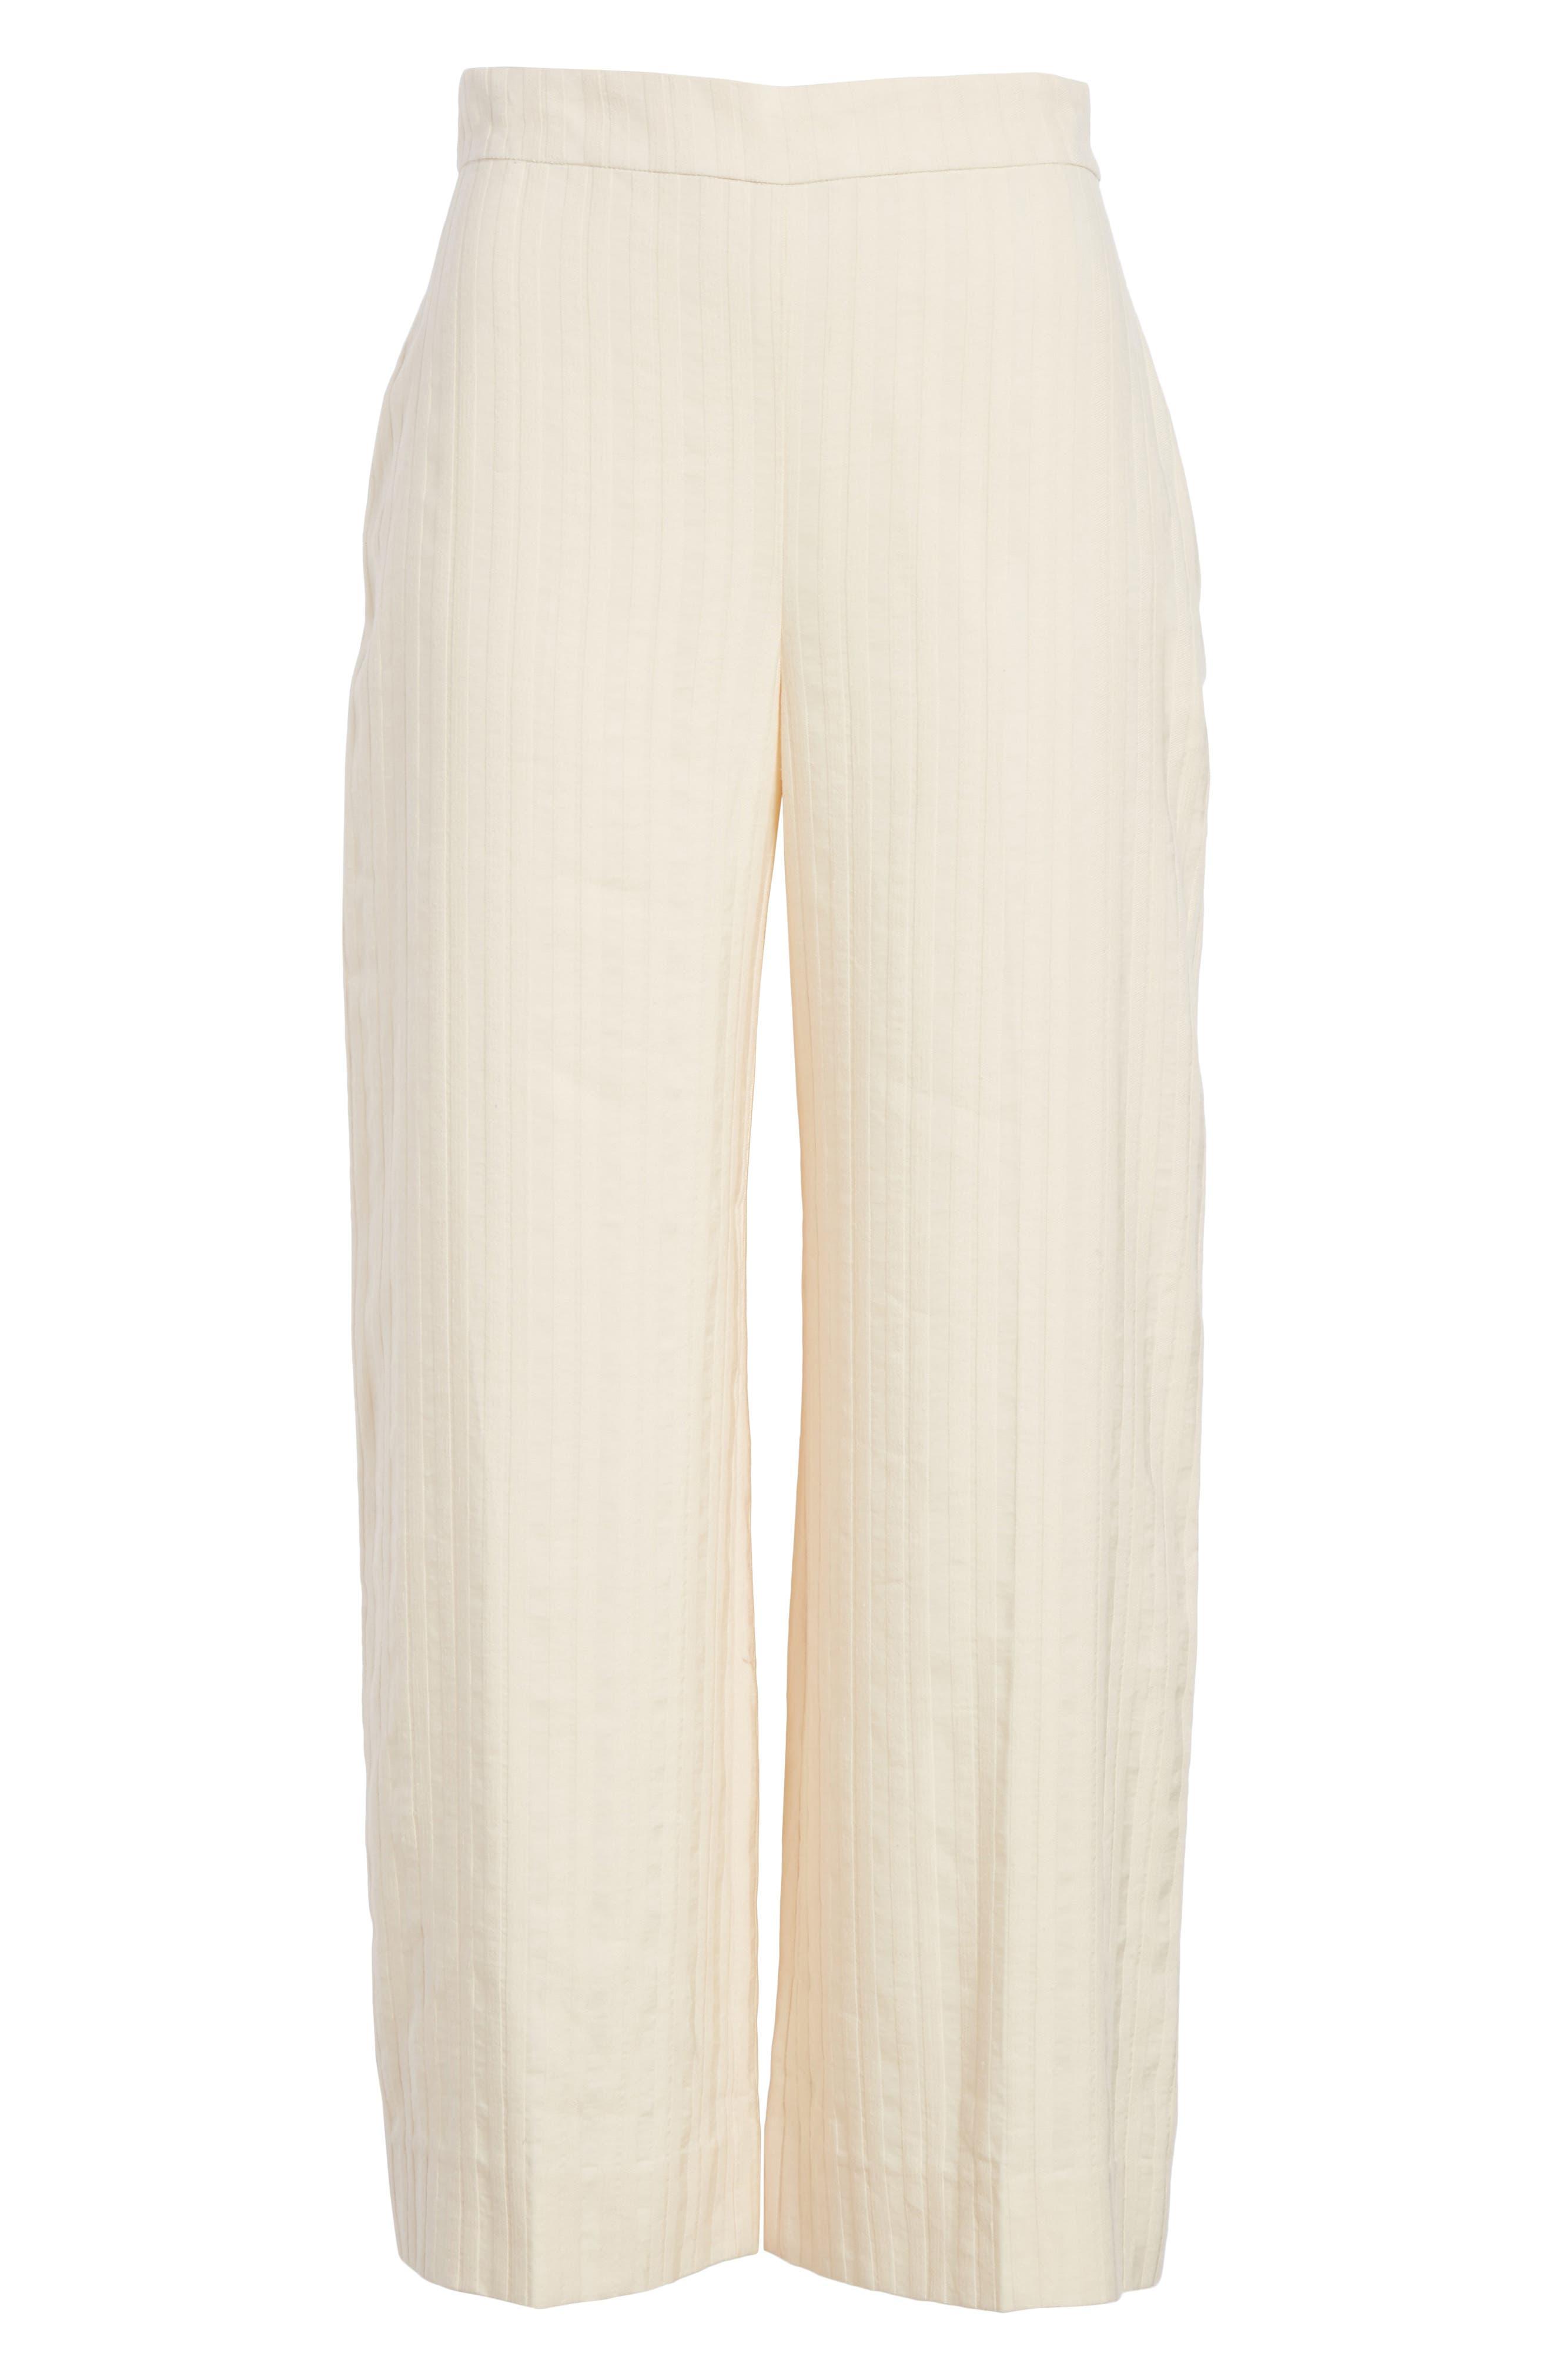 Textured Stripe Crop Pants,                             Alternate thumbnail 6, color,